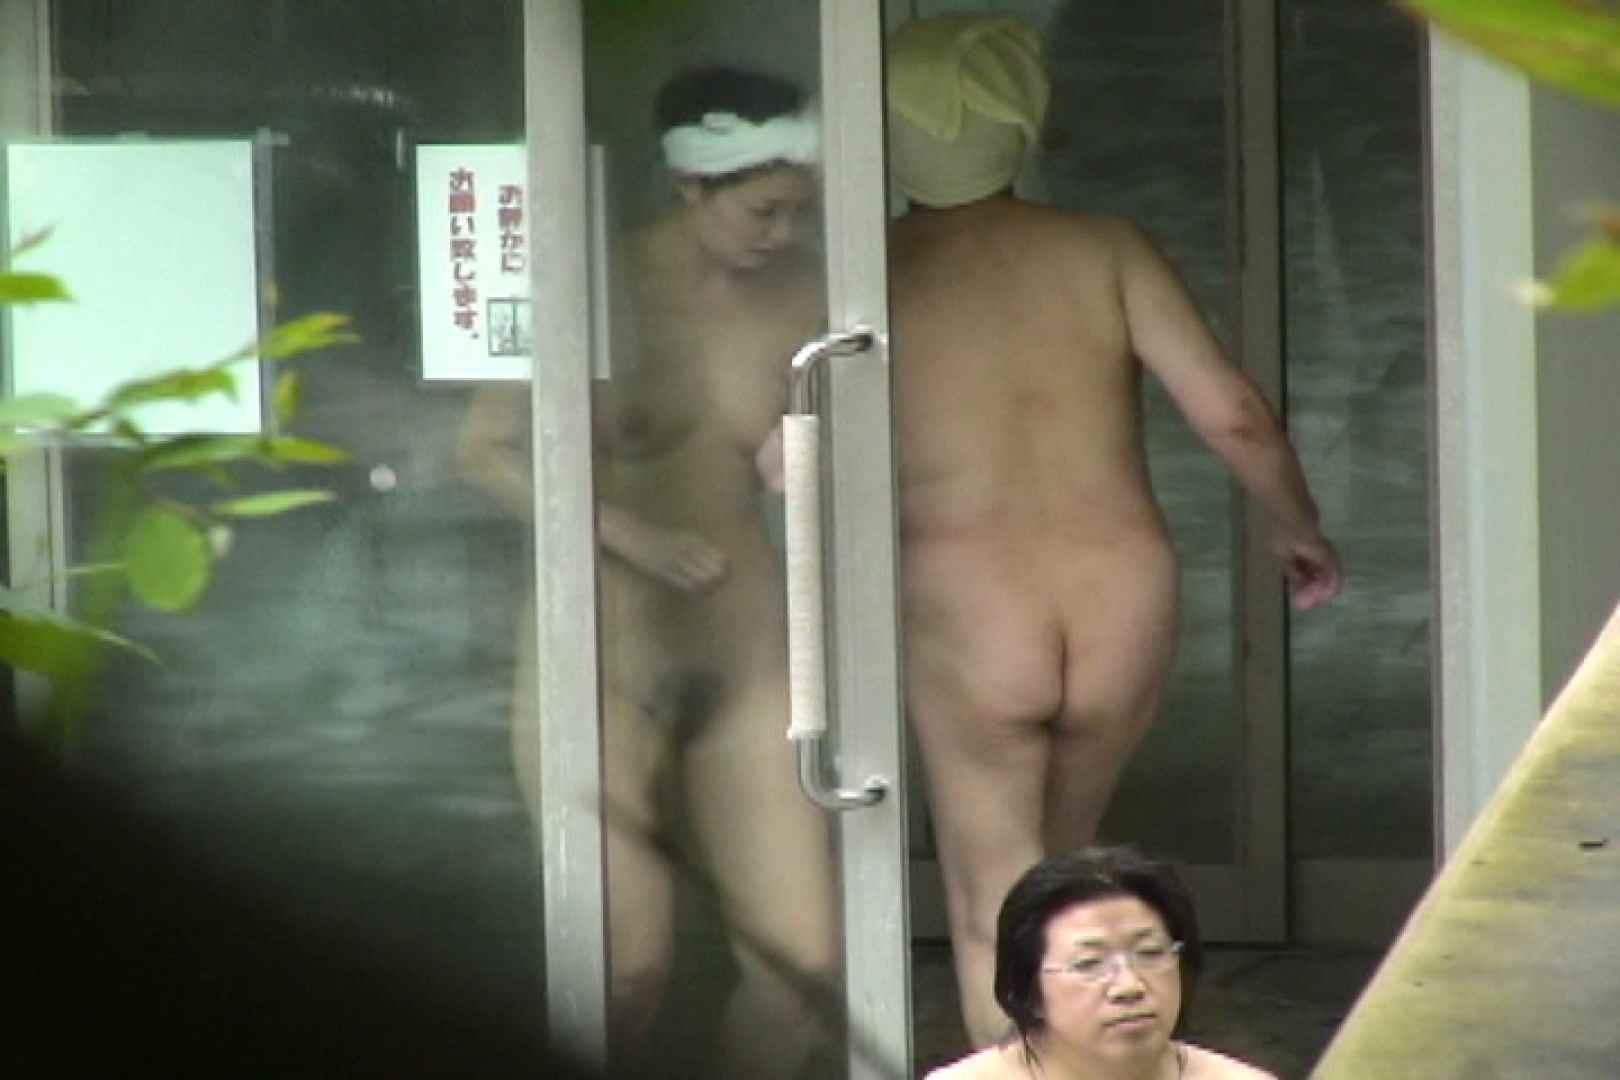 Aquaな露天風呂Vol.701 0  89連発 45